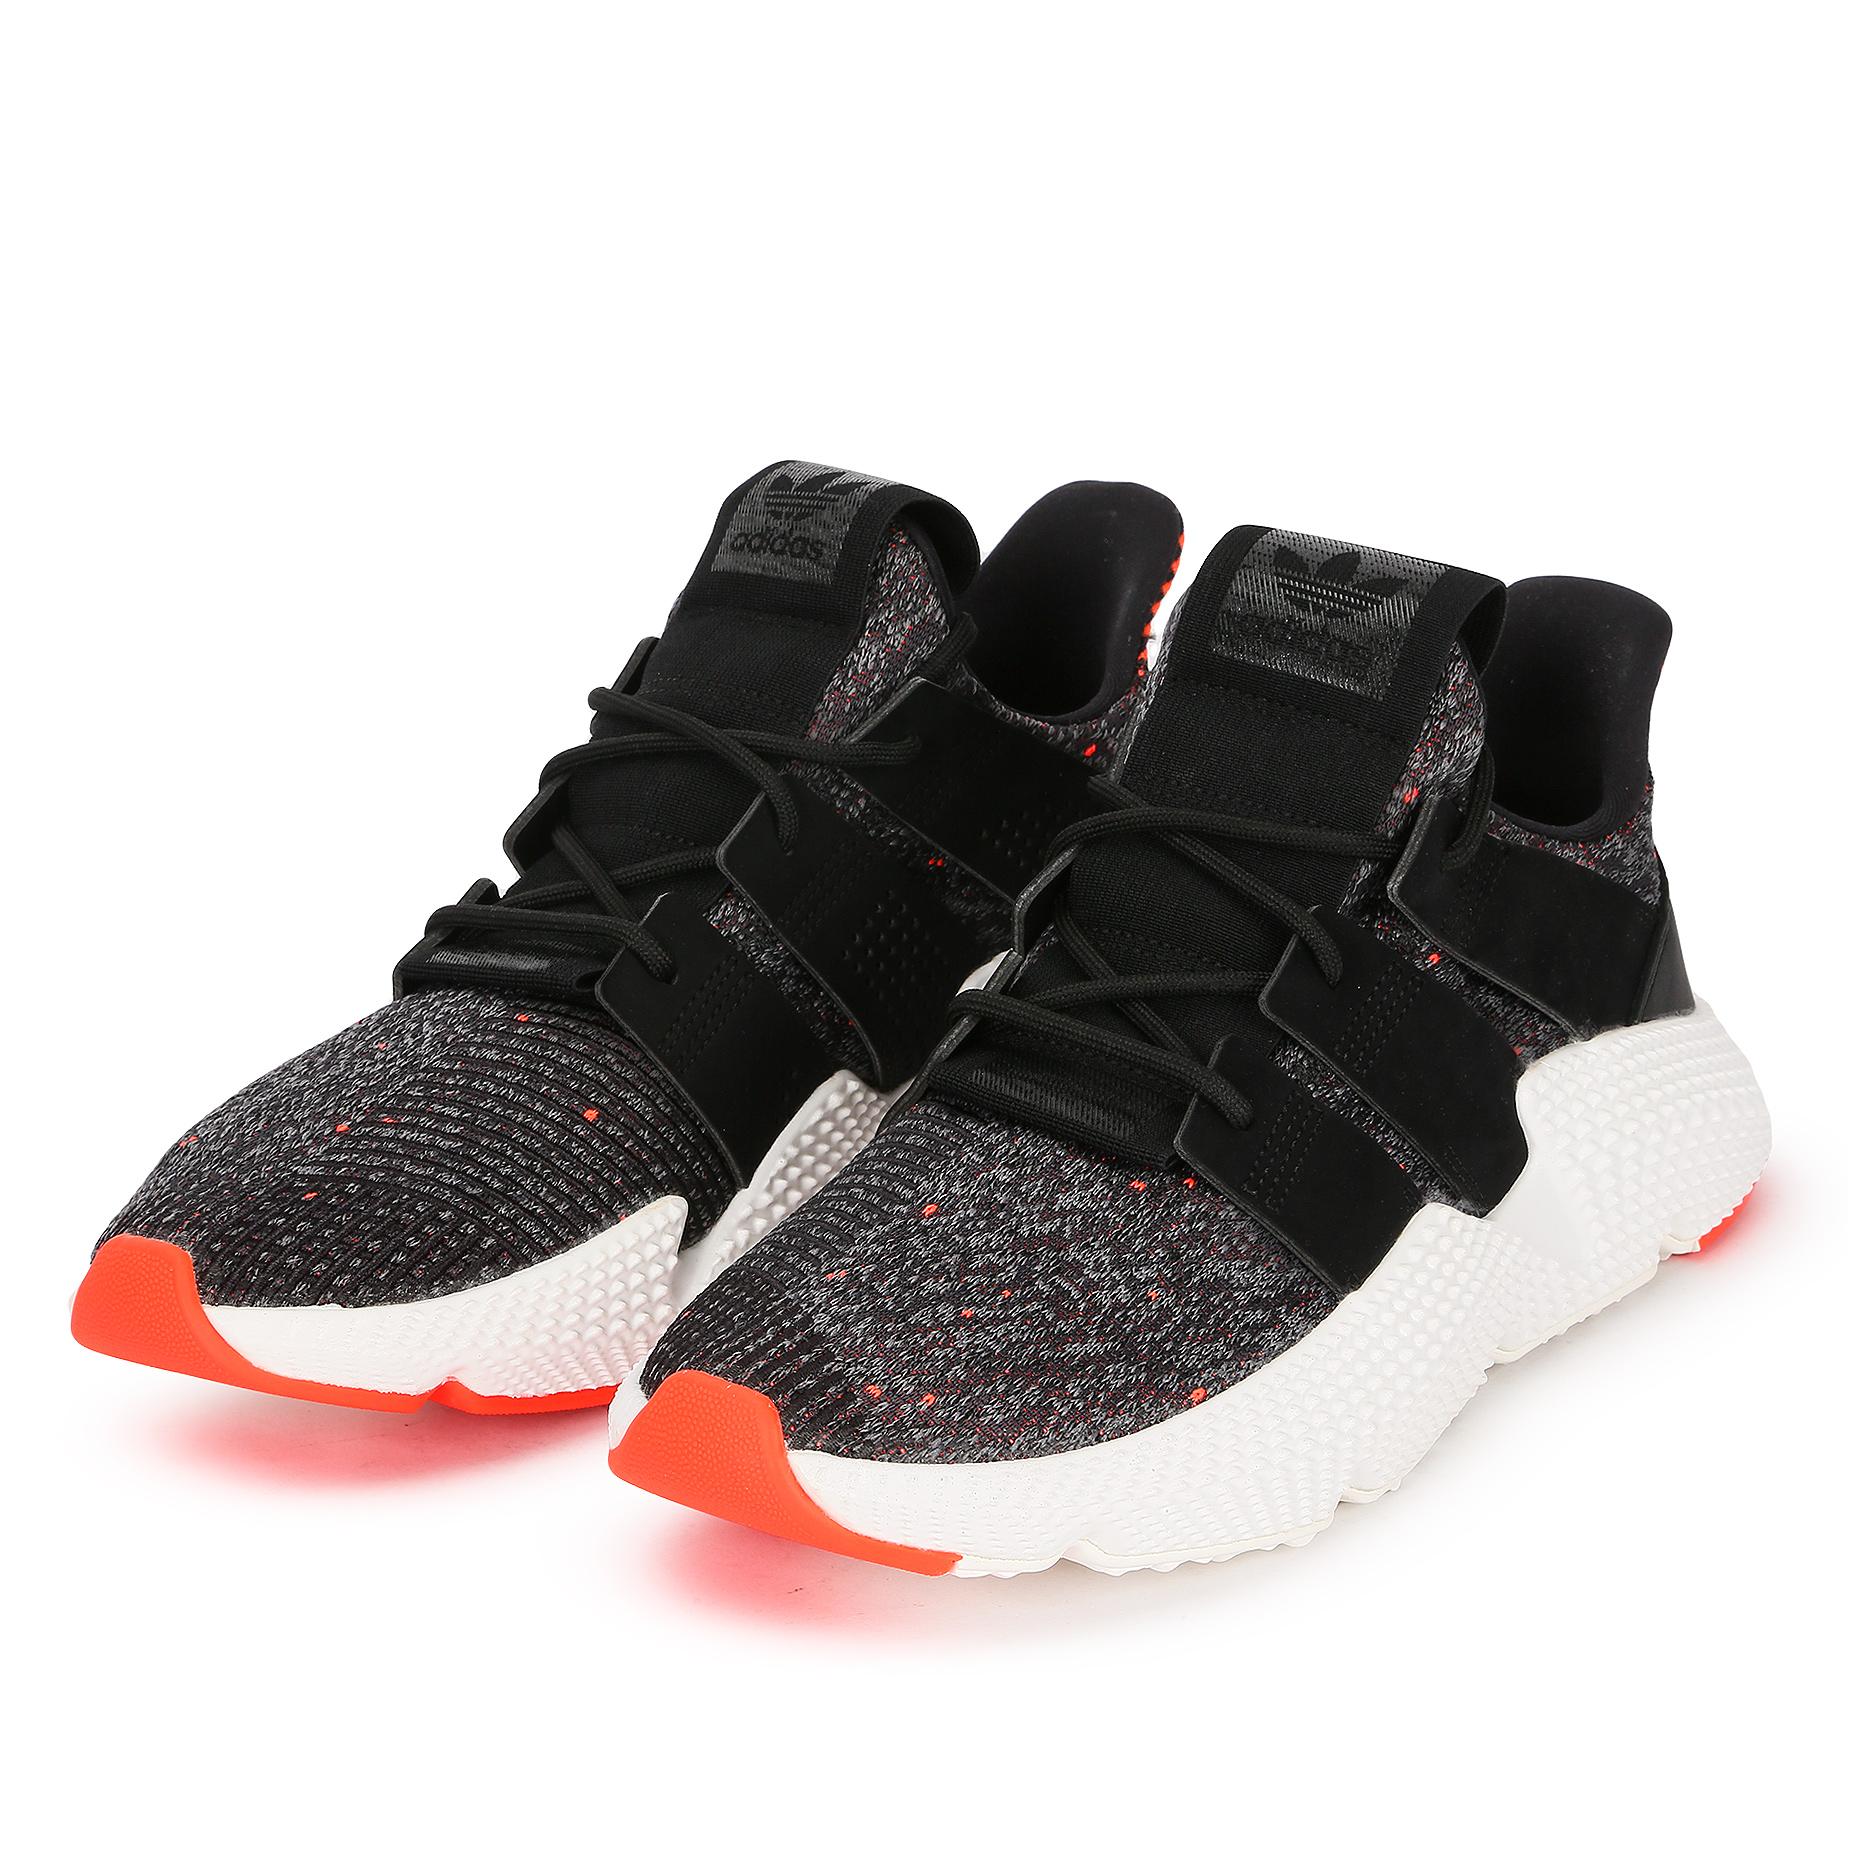 3b82f8d2 Мужские кроссовки adidas Originals Prophere Black/Solar Red - фото 2